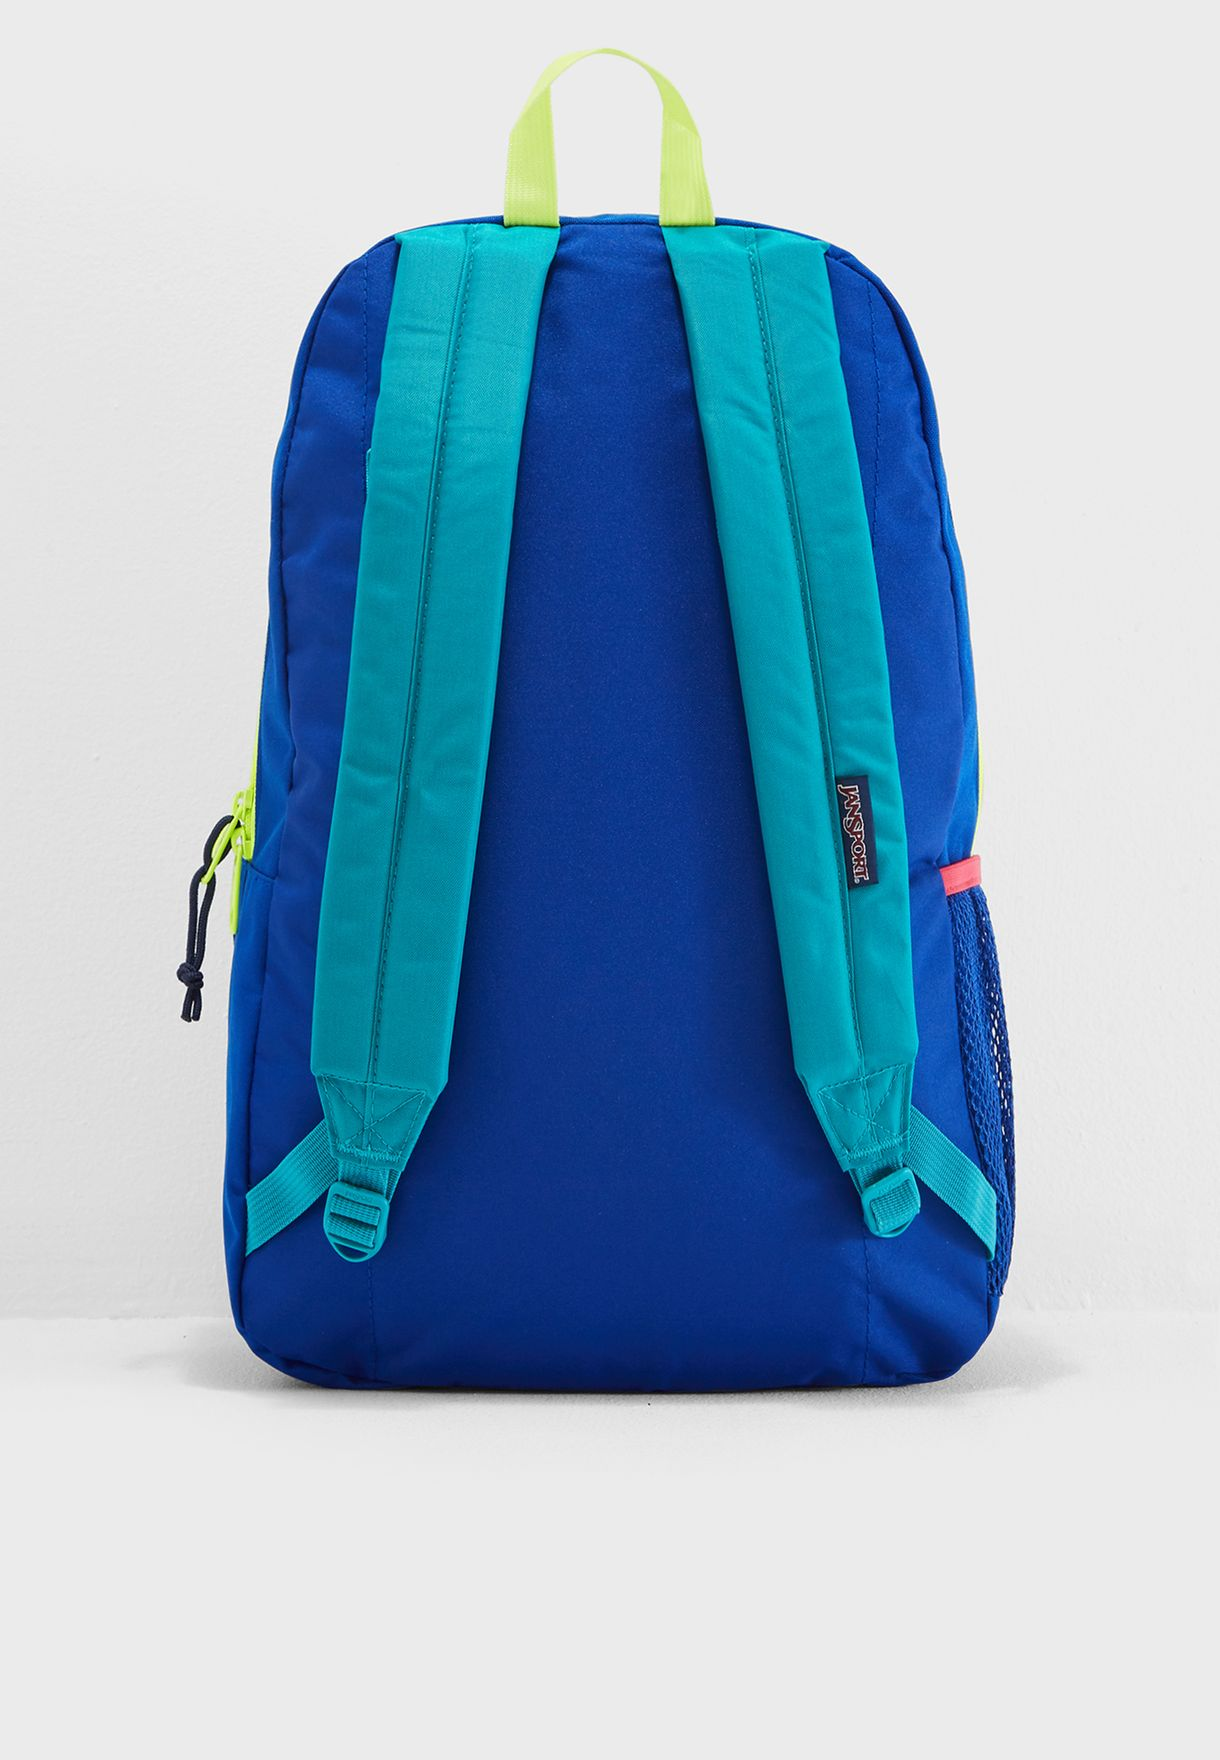 Super Sneak Backpack